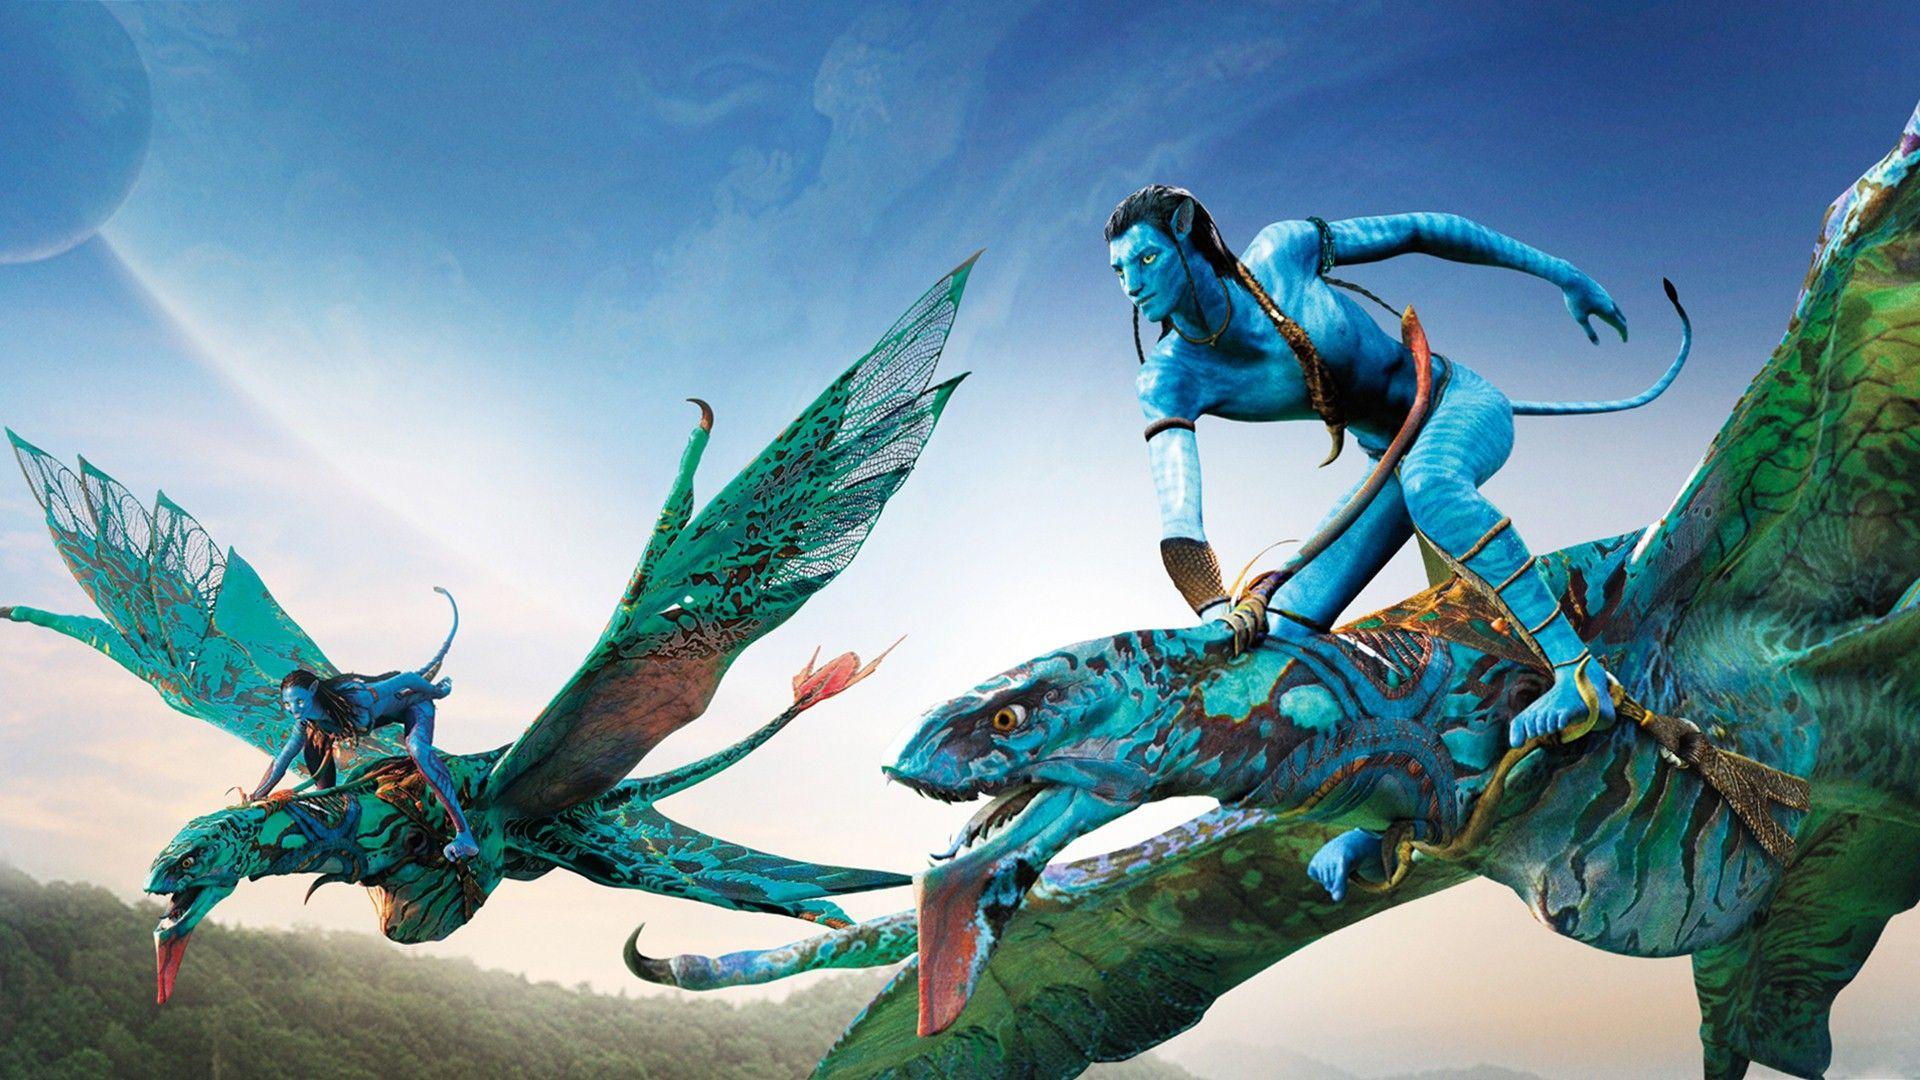 Avator The Great Movies Avatar Movie Avatar Full Movie Download Avatar